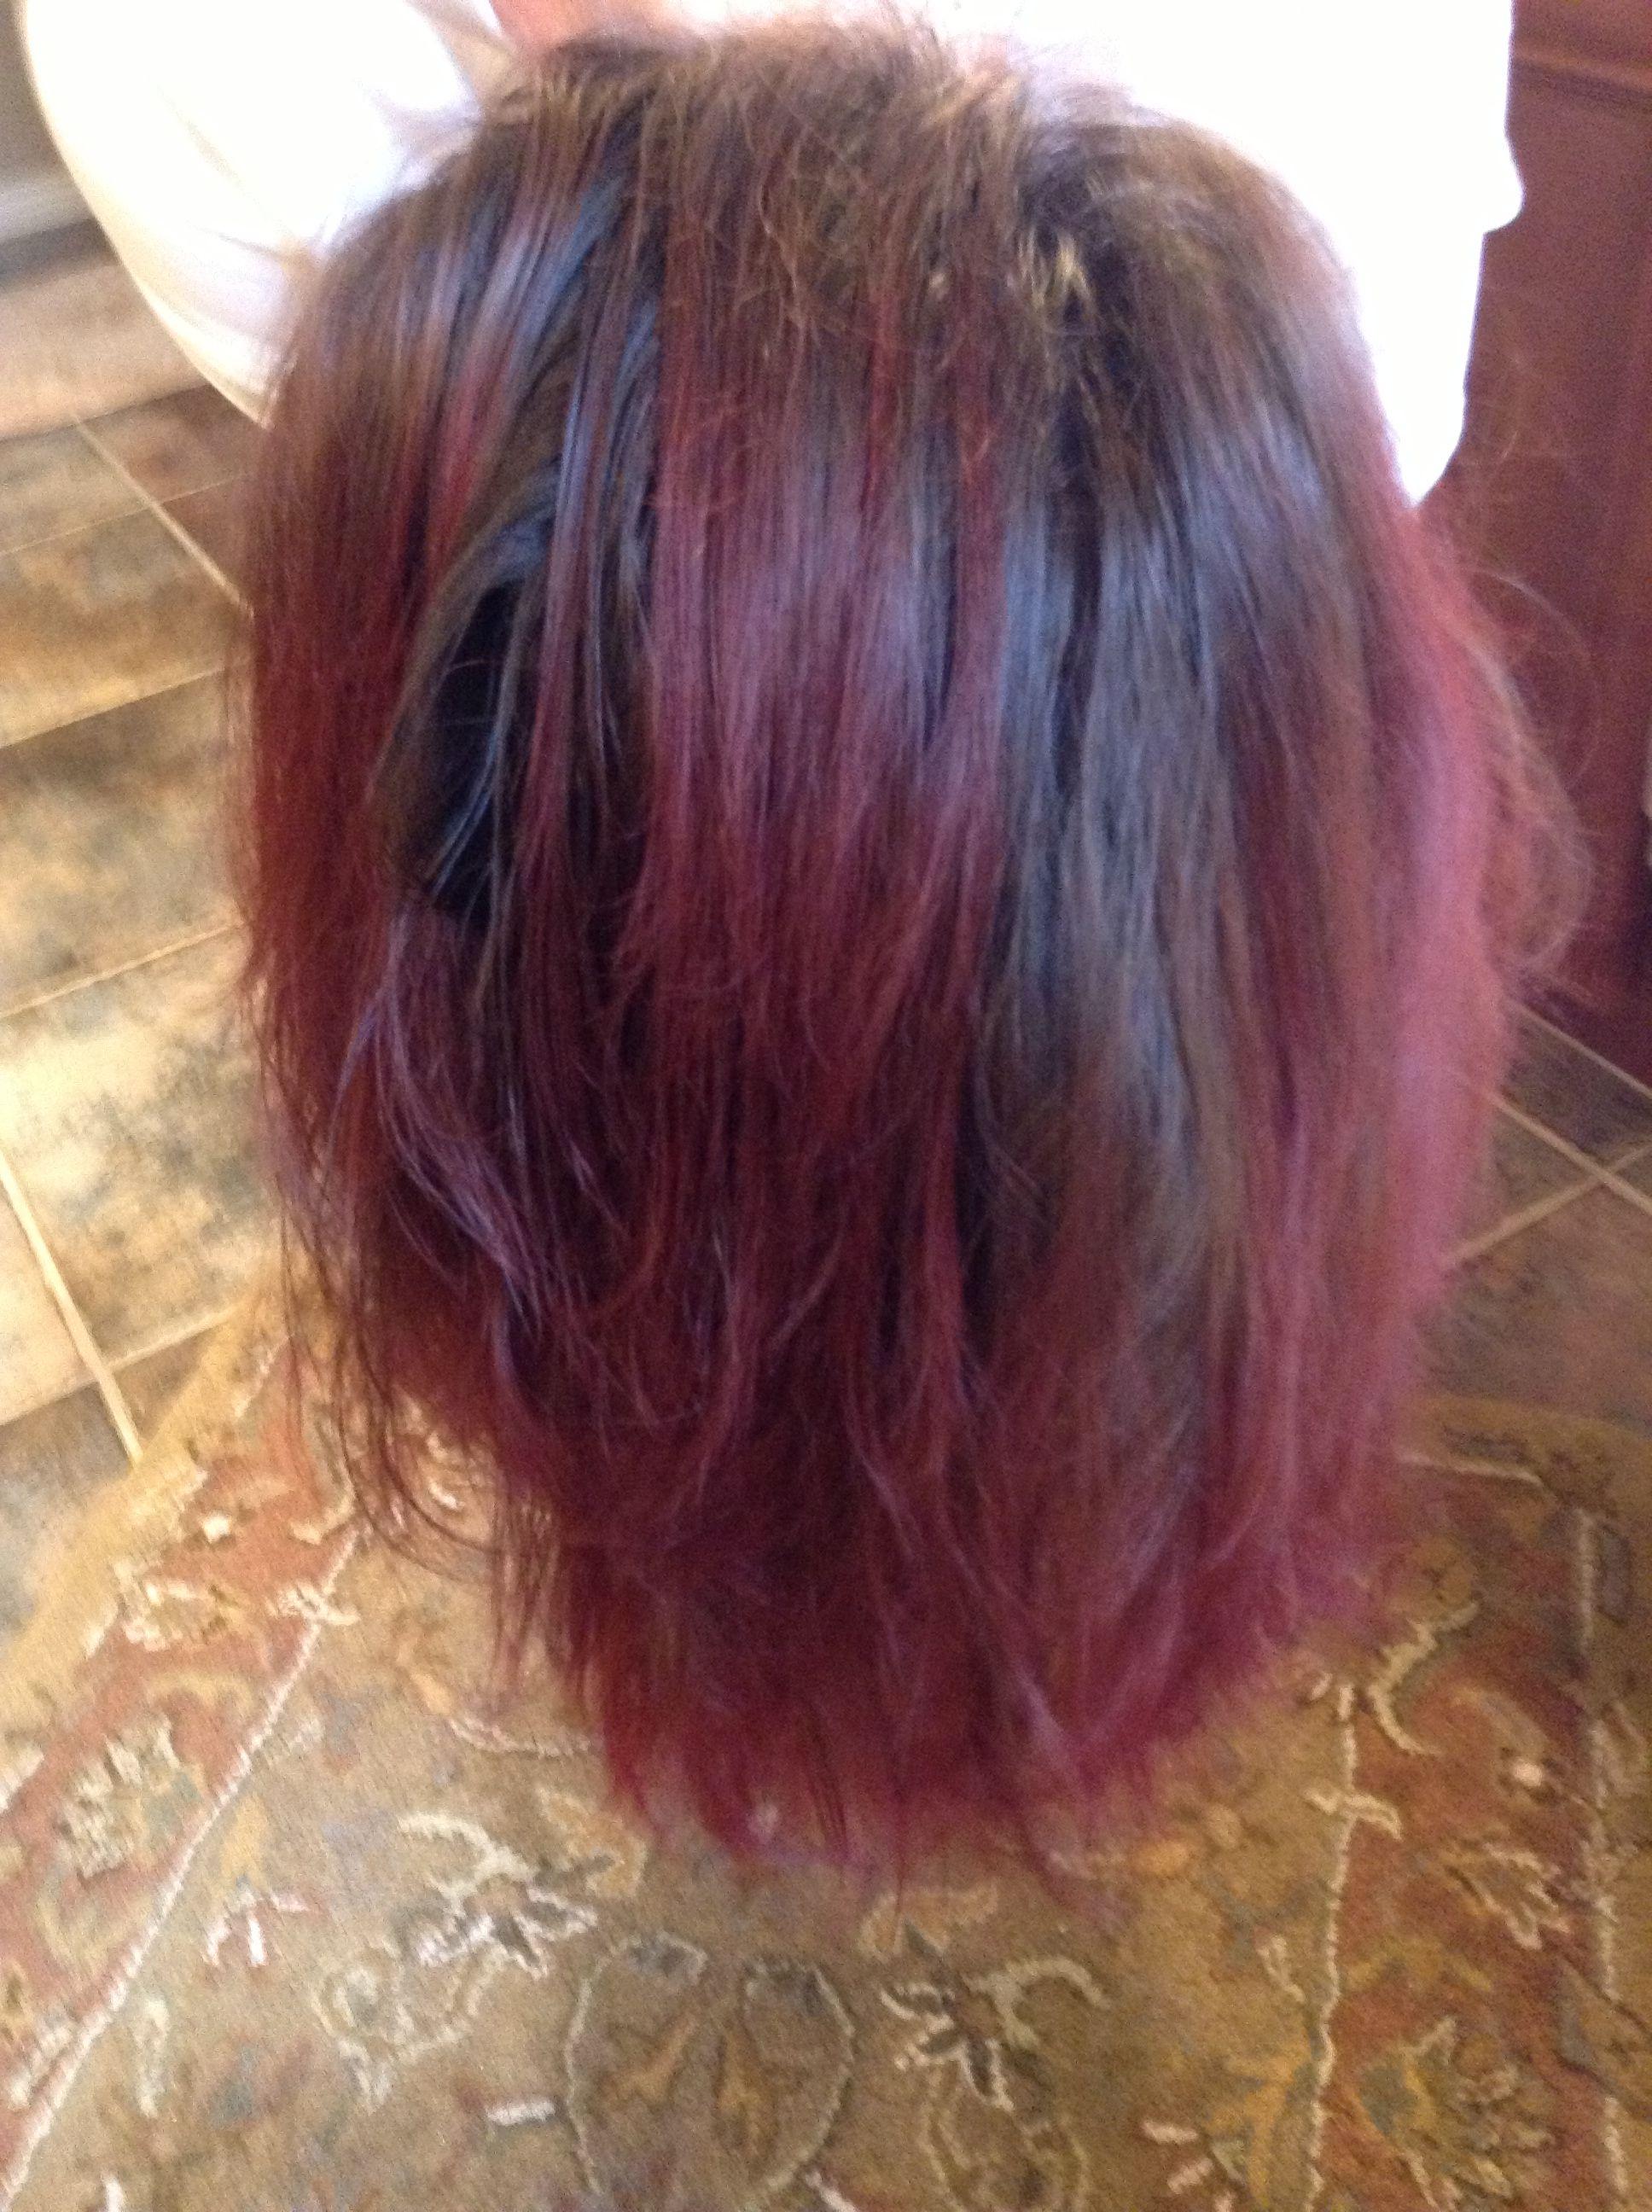 Cat B S Kool Aid Dip Dye I Have Super Dark Hair And Guess What I Didn T Even Bleach It But Make Yourself Com Kool Aid Hair Dye Hair Dye Colors Brunette